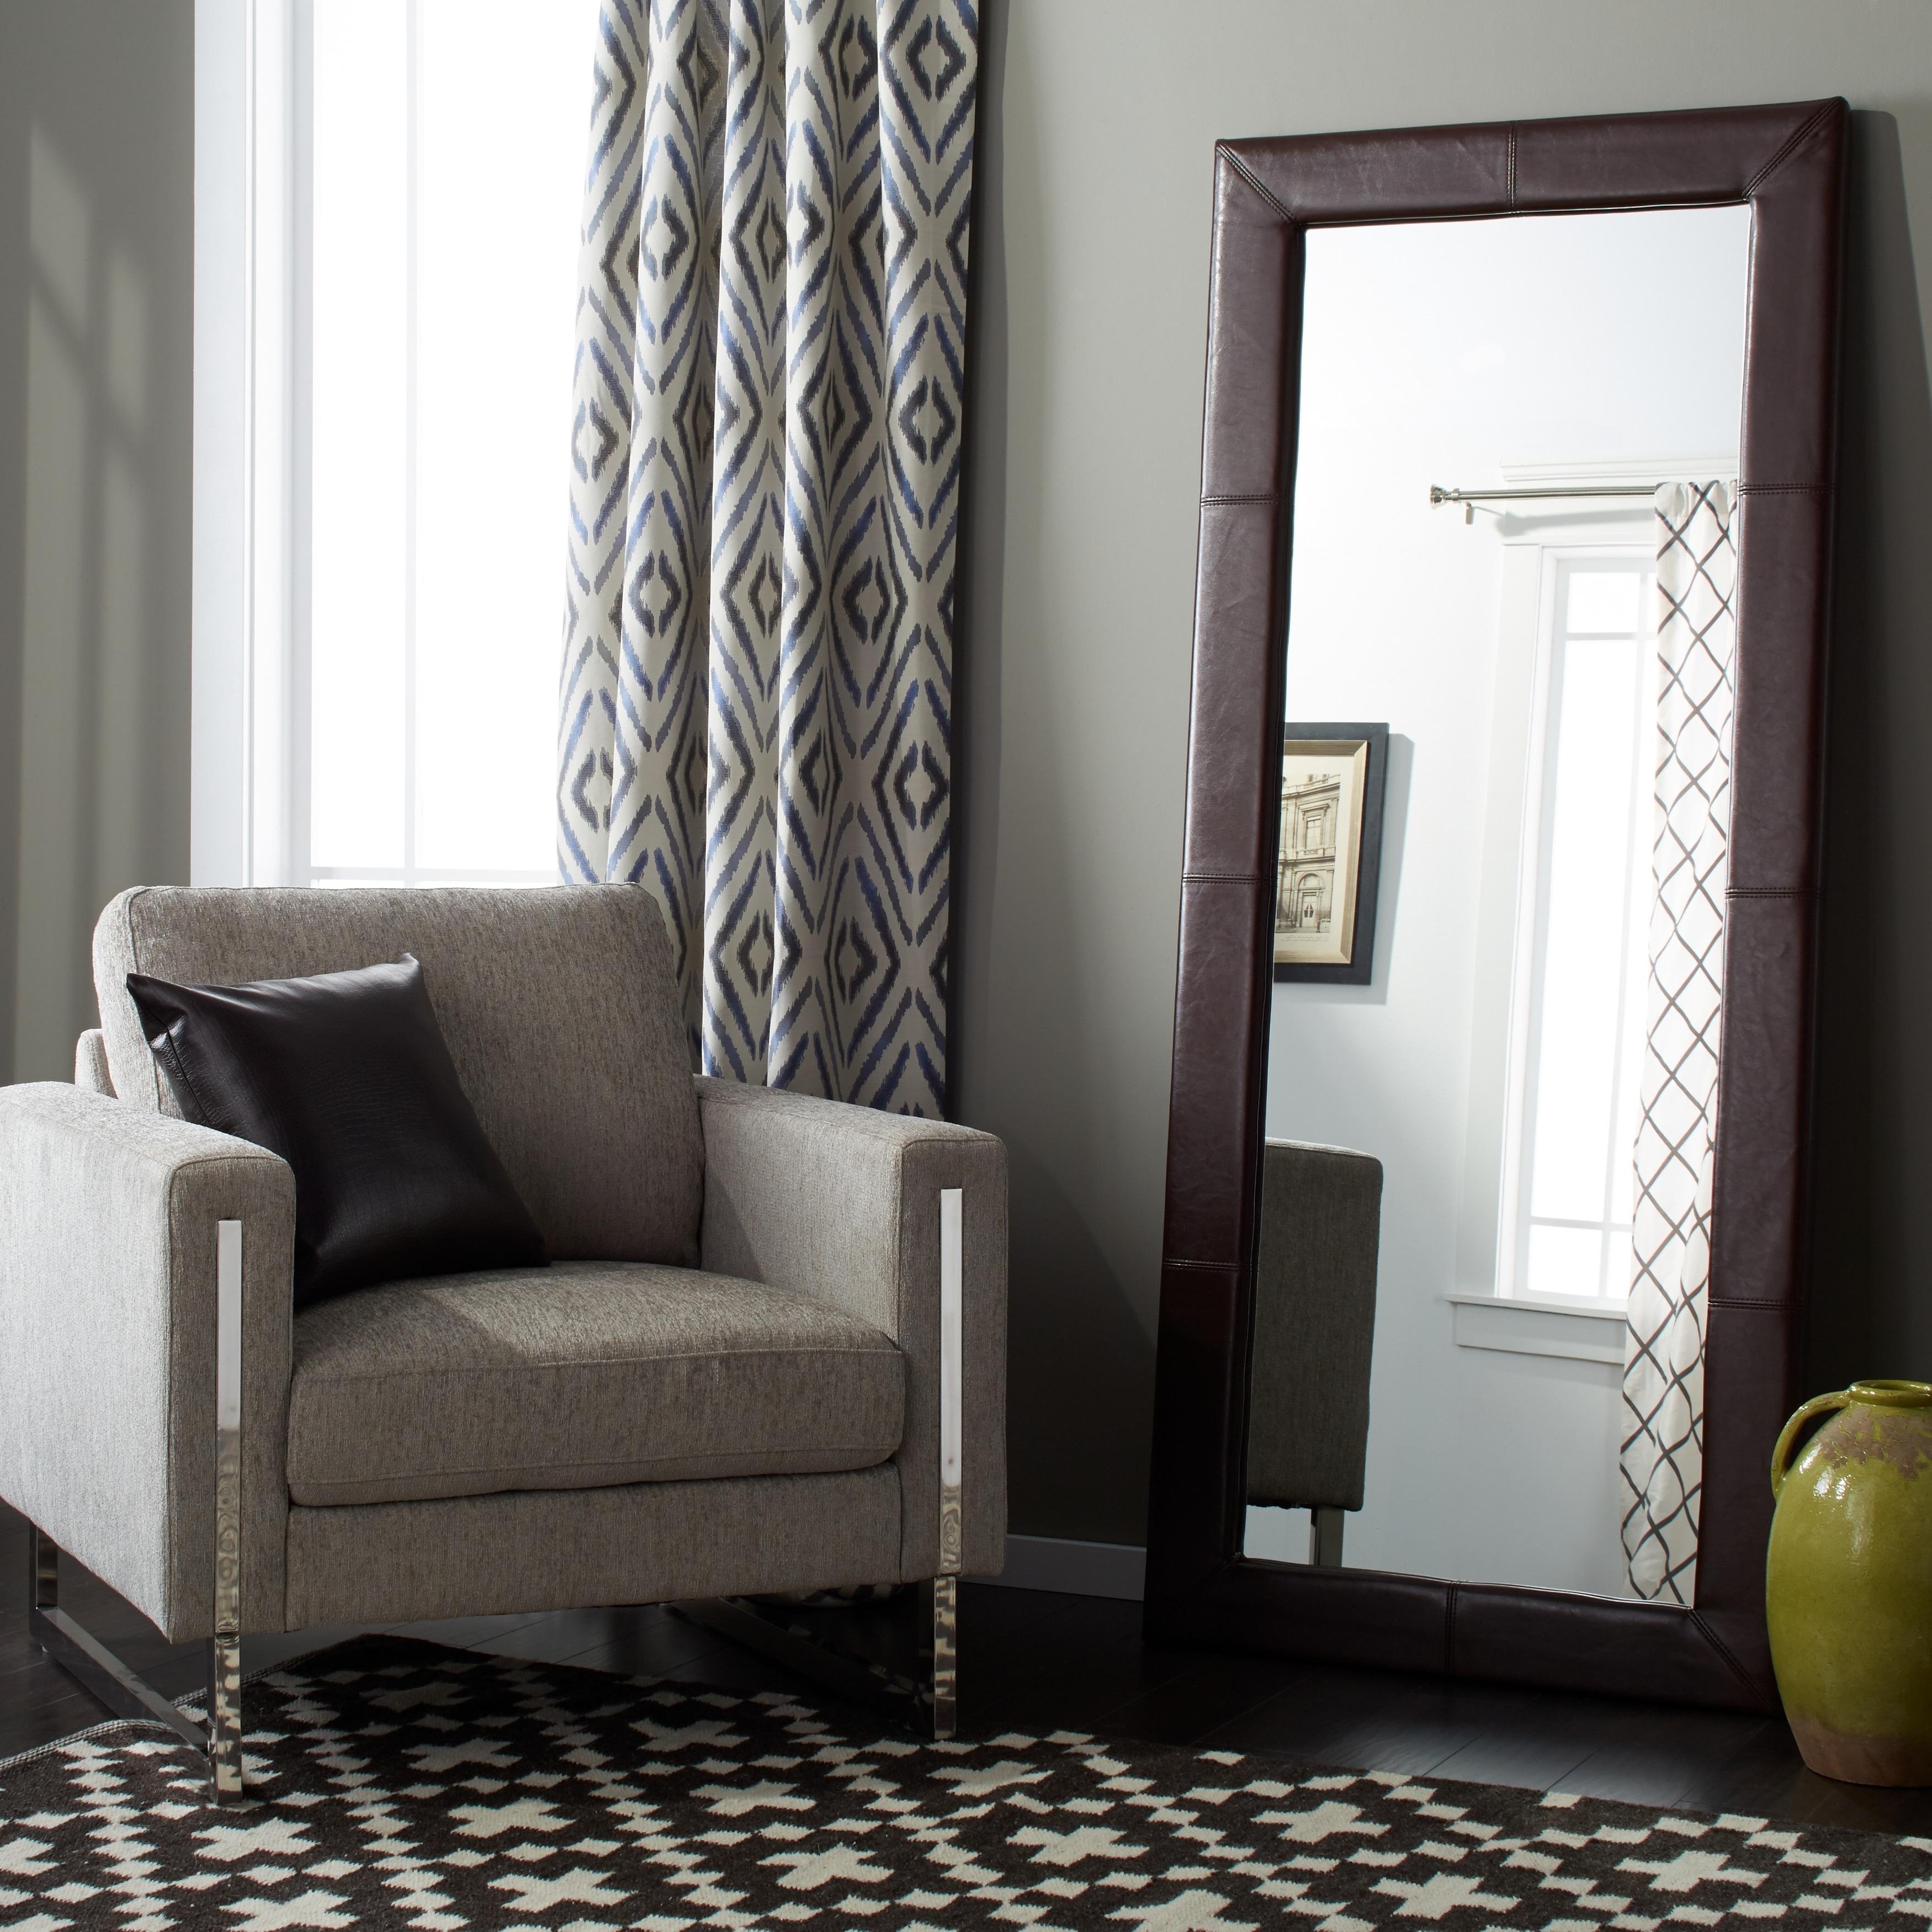 Abbyson Delano Dark Brown Leather Floor Mirror On Sale Overstock 6332765